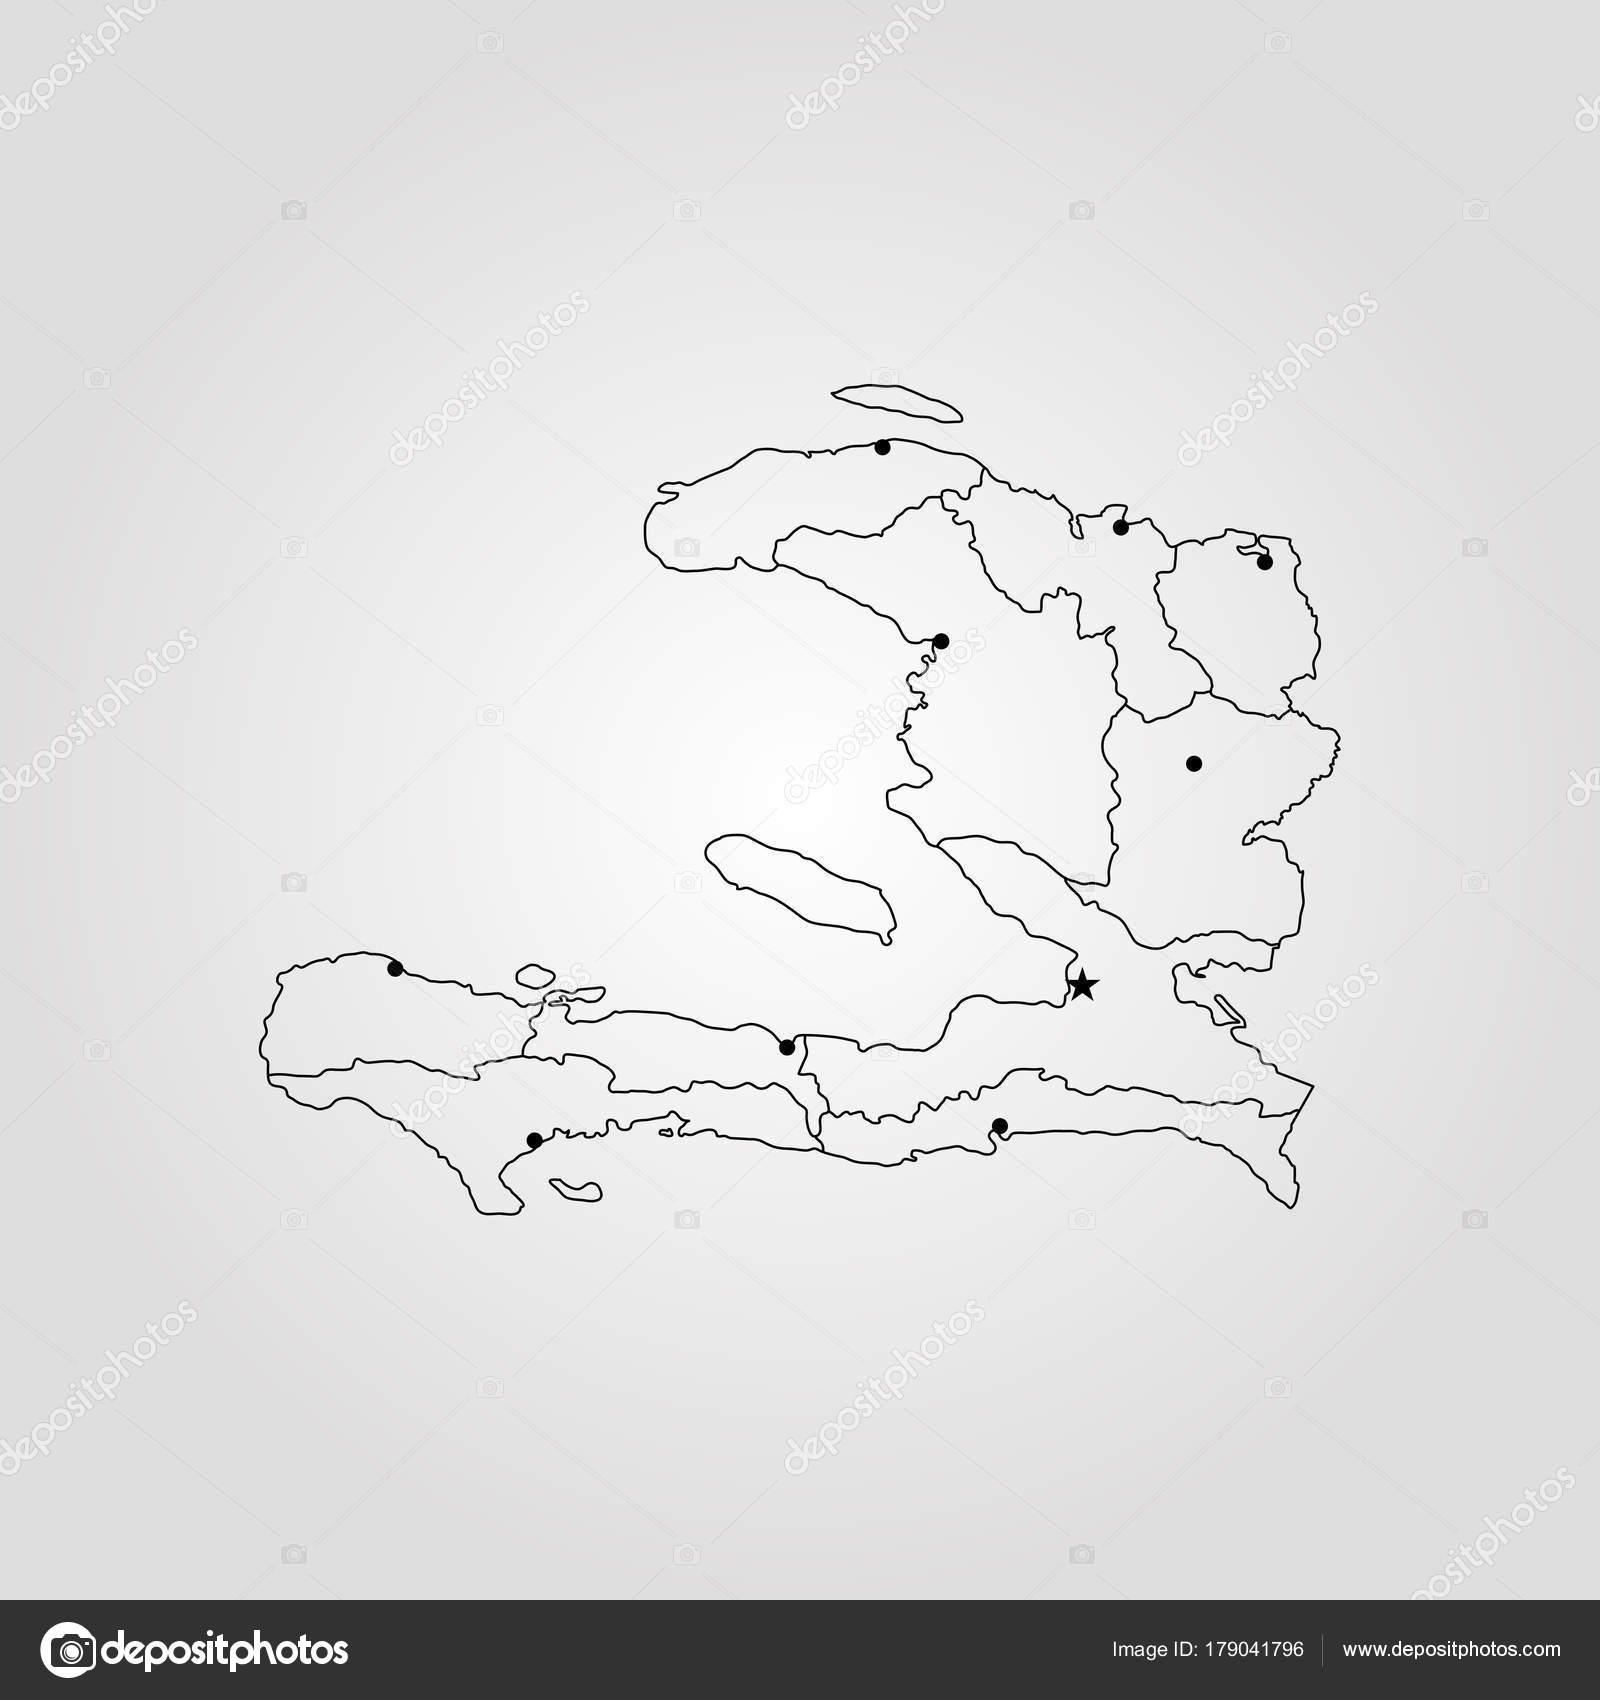 mapa de haití — Vector de stock © Uglegorets #179041796